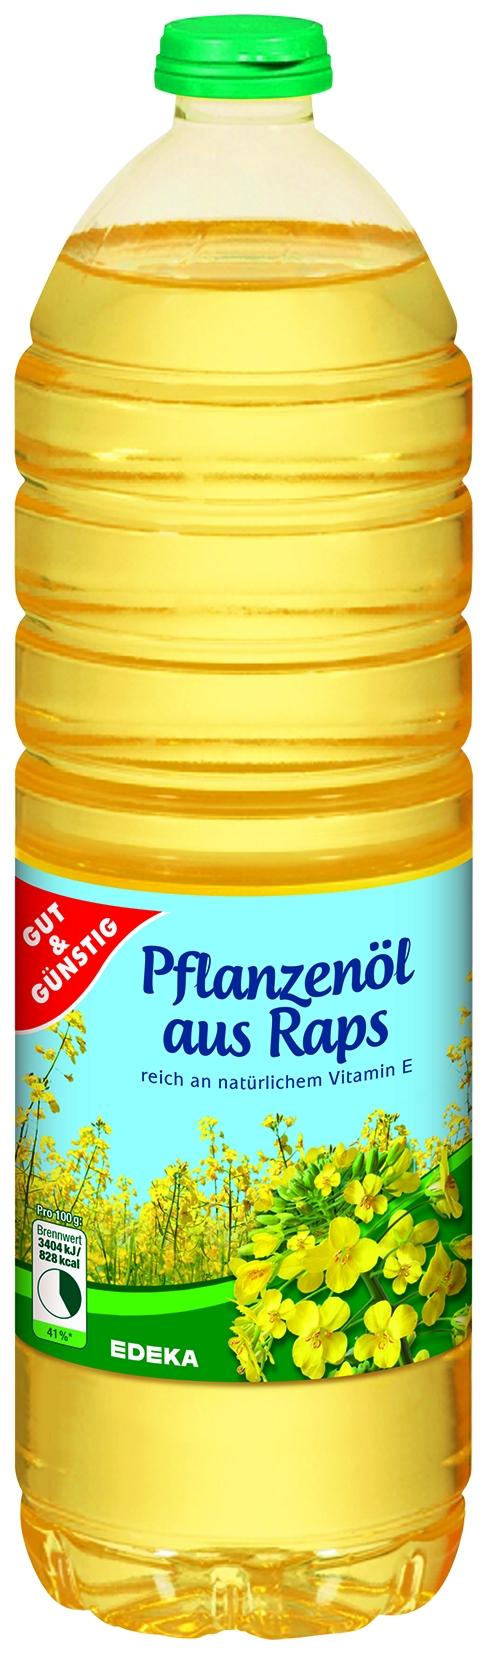 Pflanzenoel aus Raps